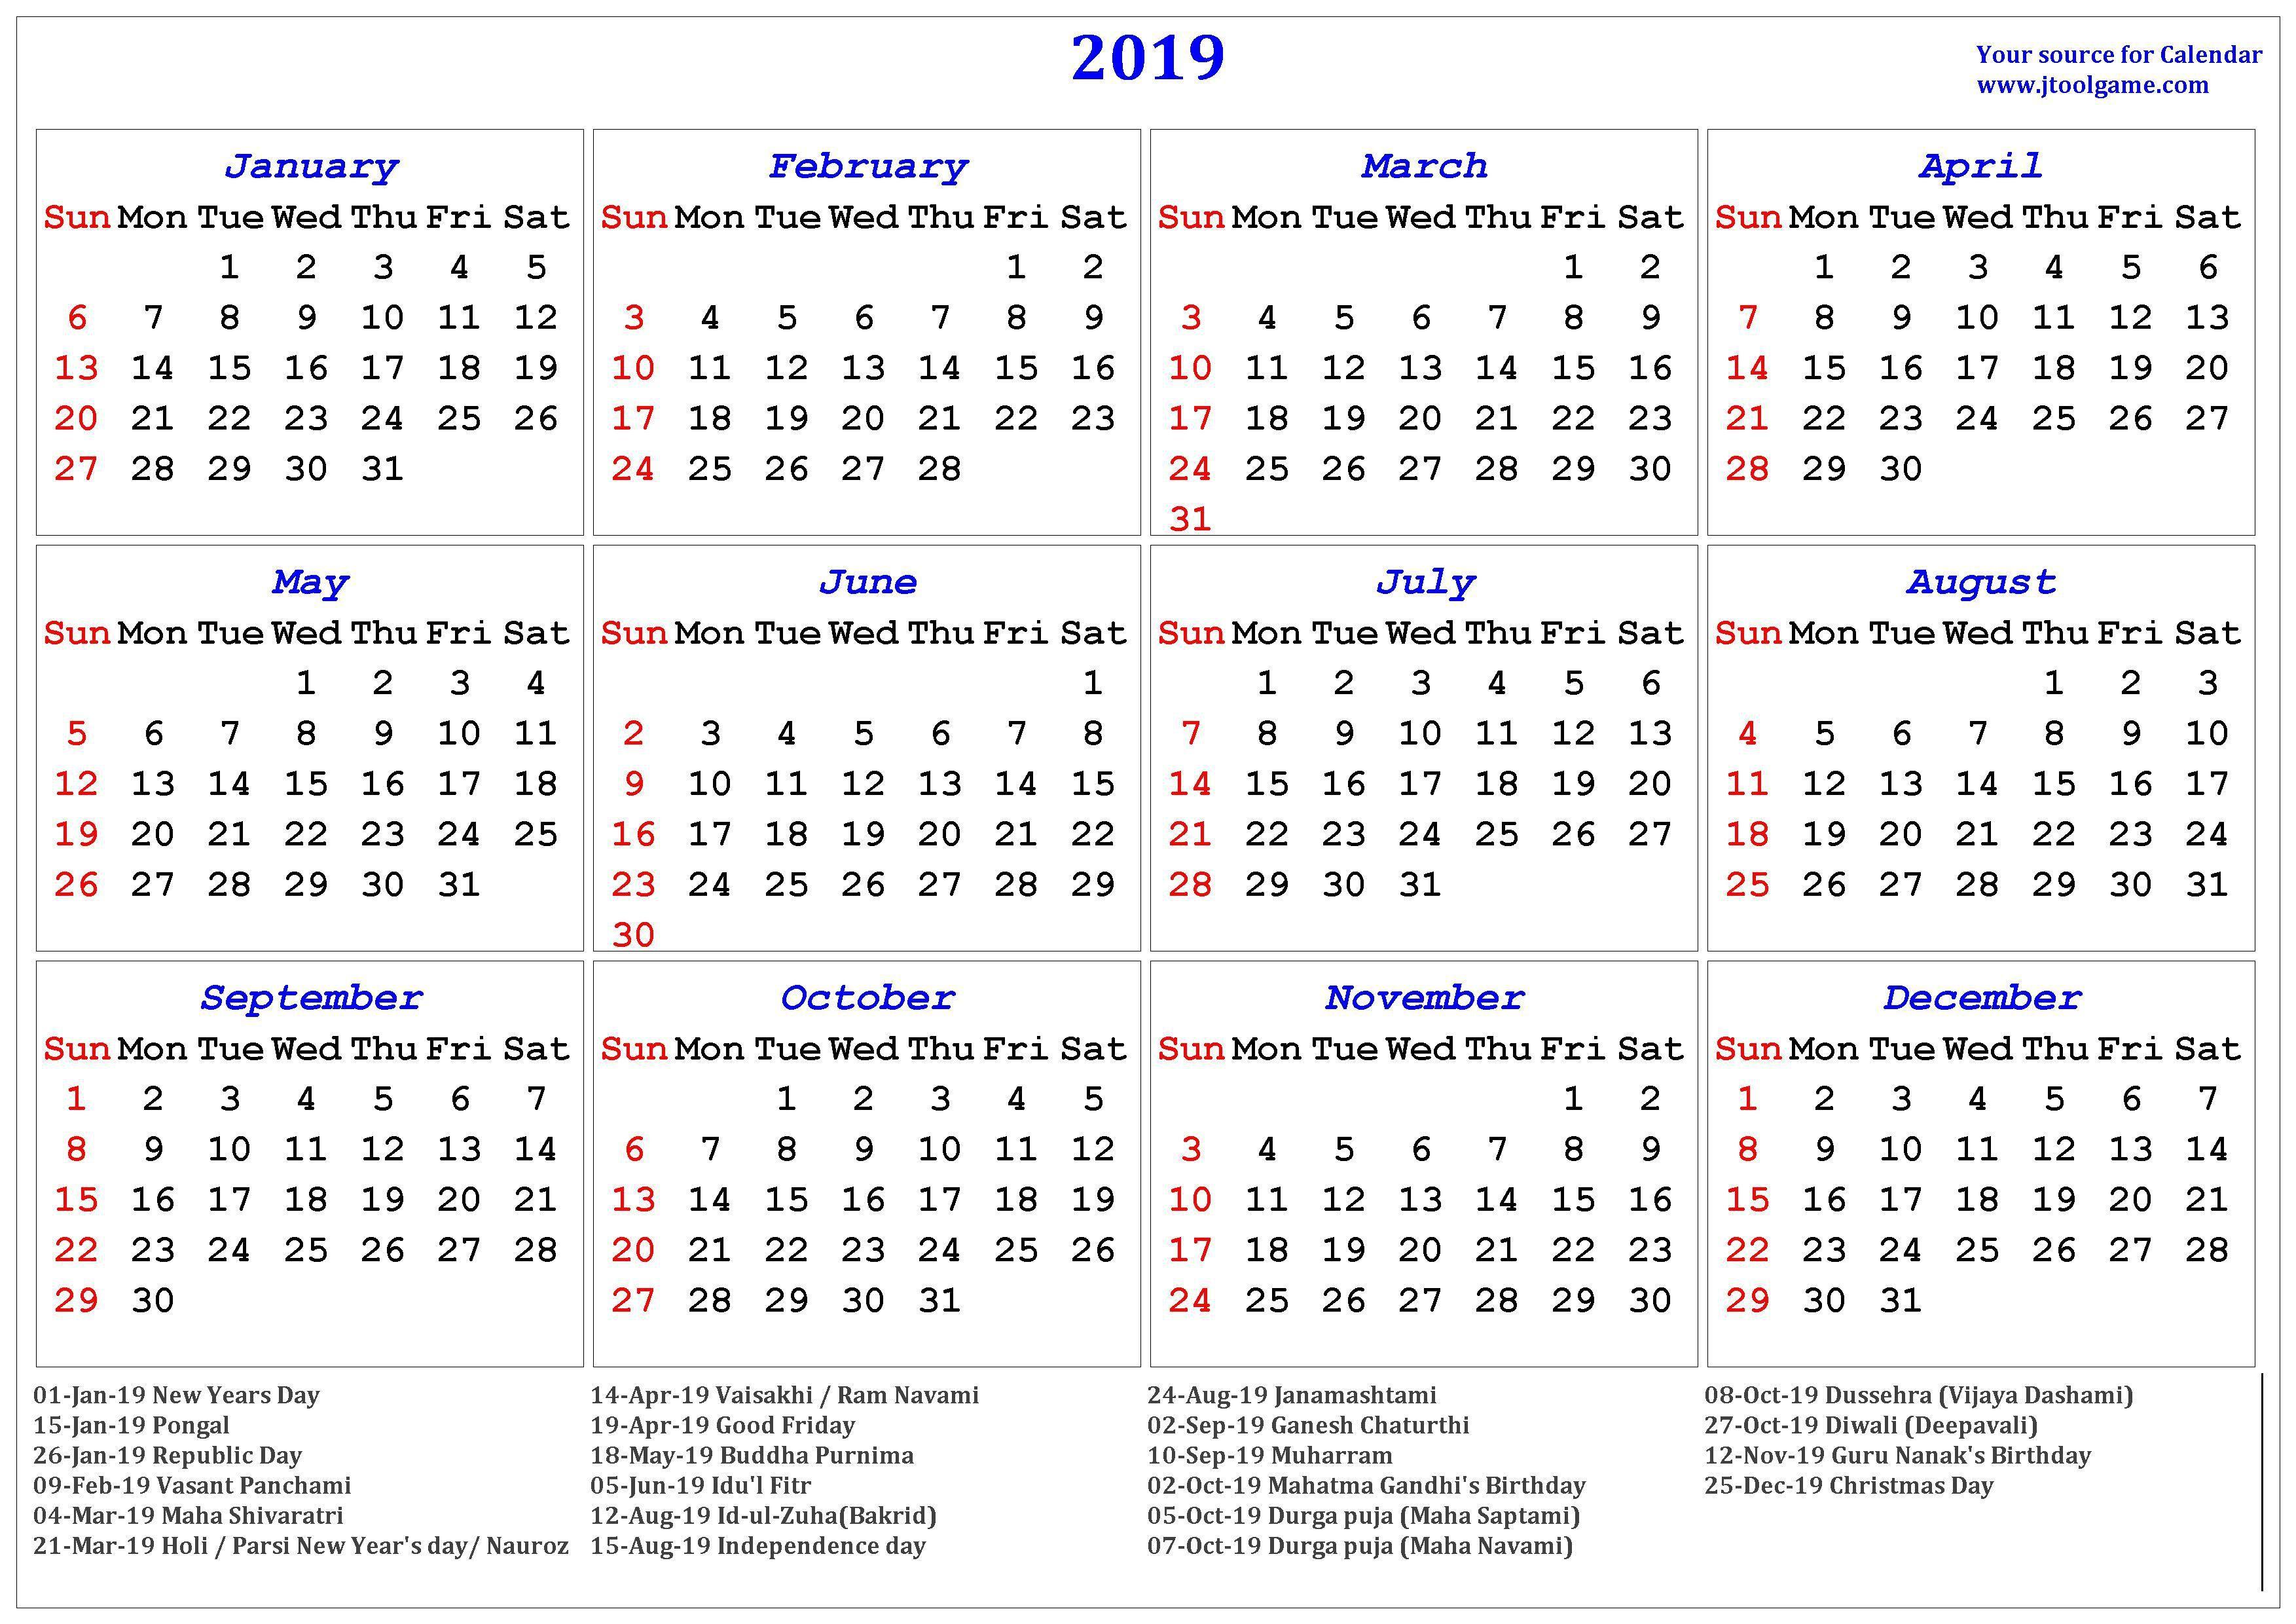 2019 Hindu Calendar with Tithi Tyohar, Holidays